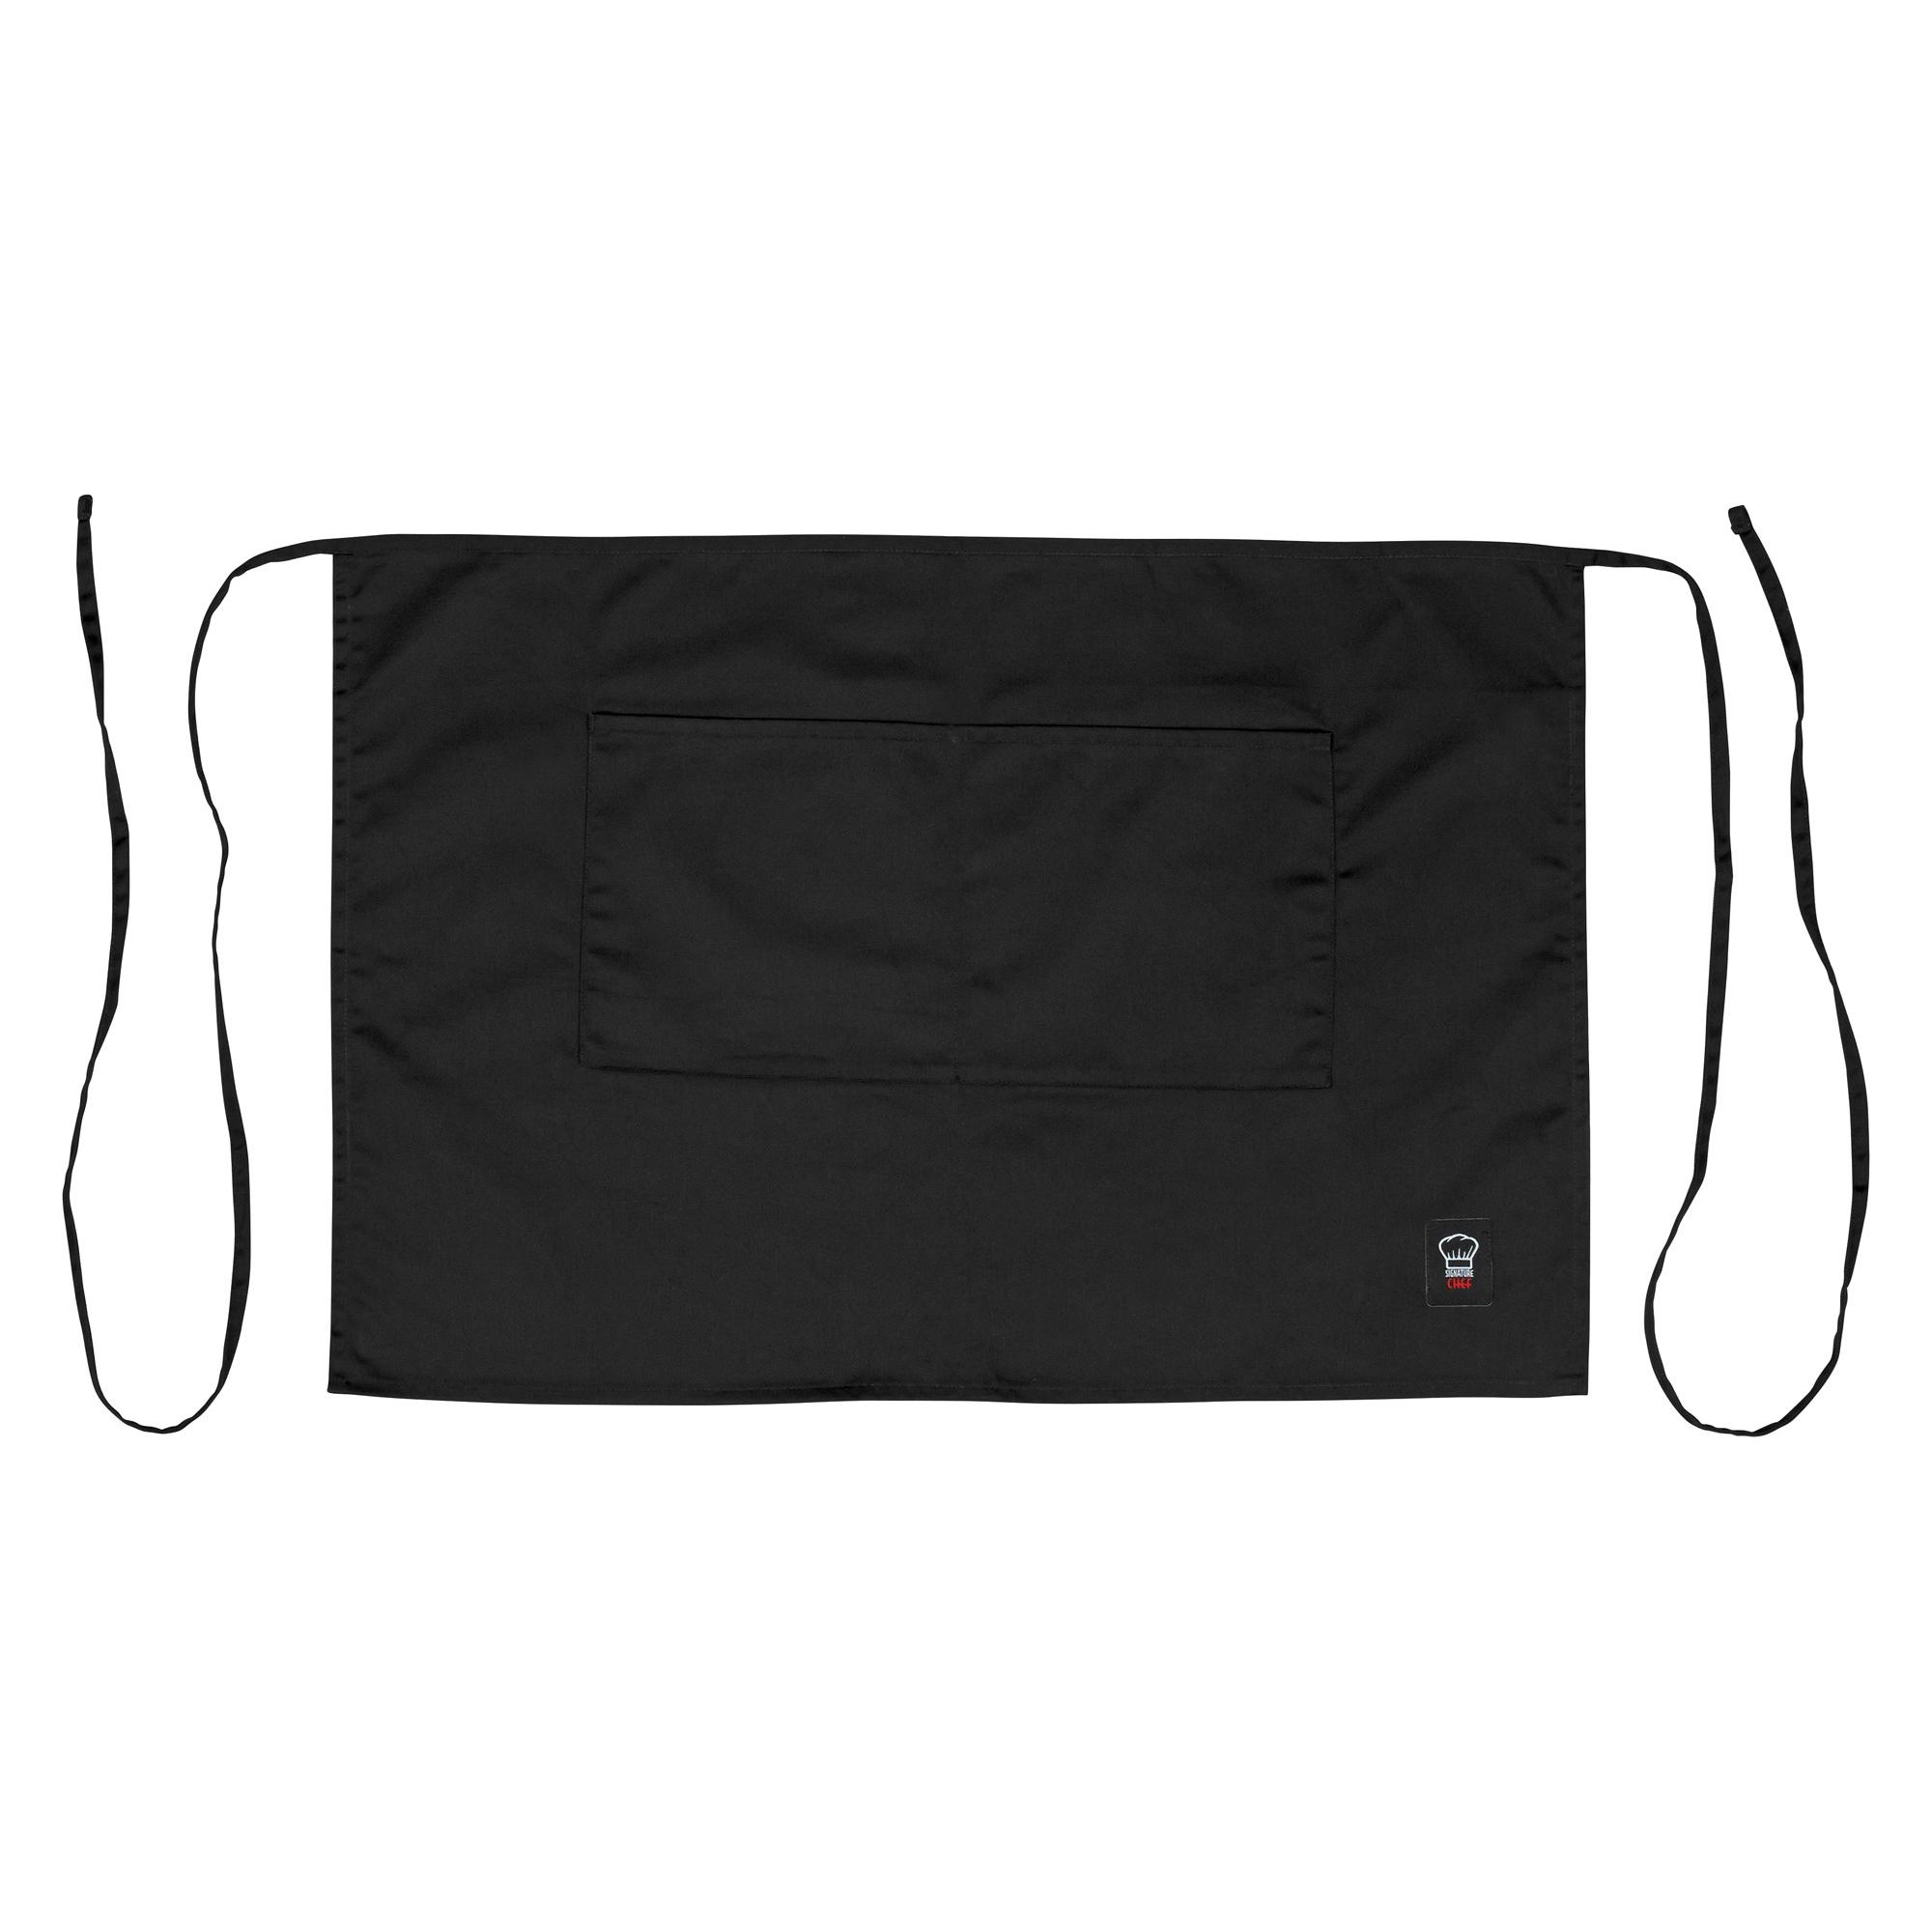 Winco WA-2819K waist apron